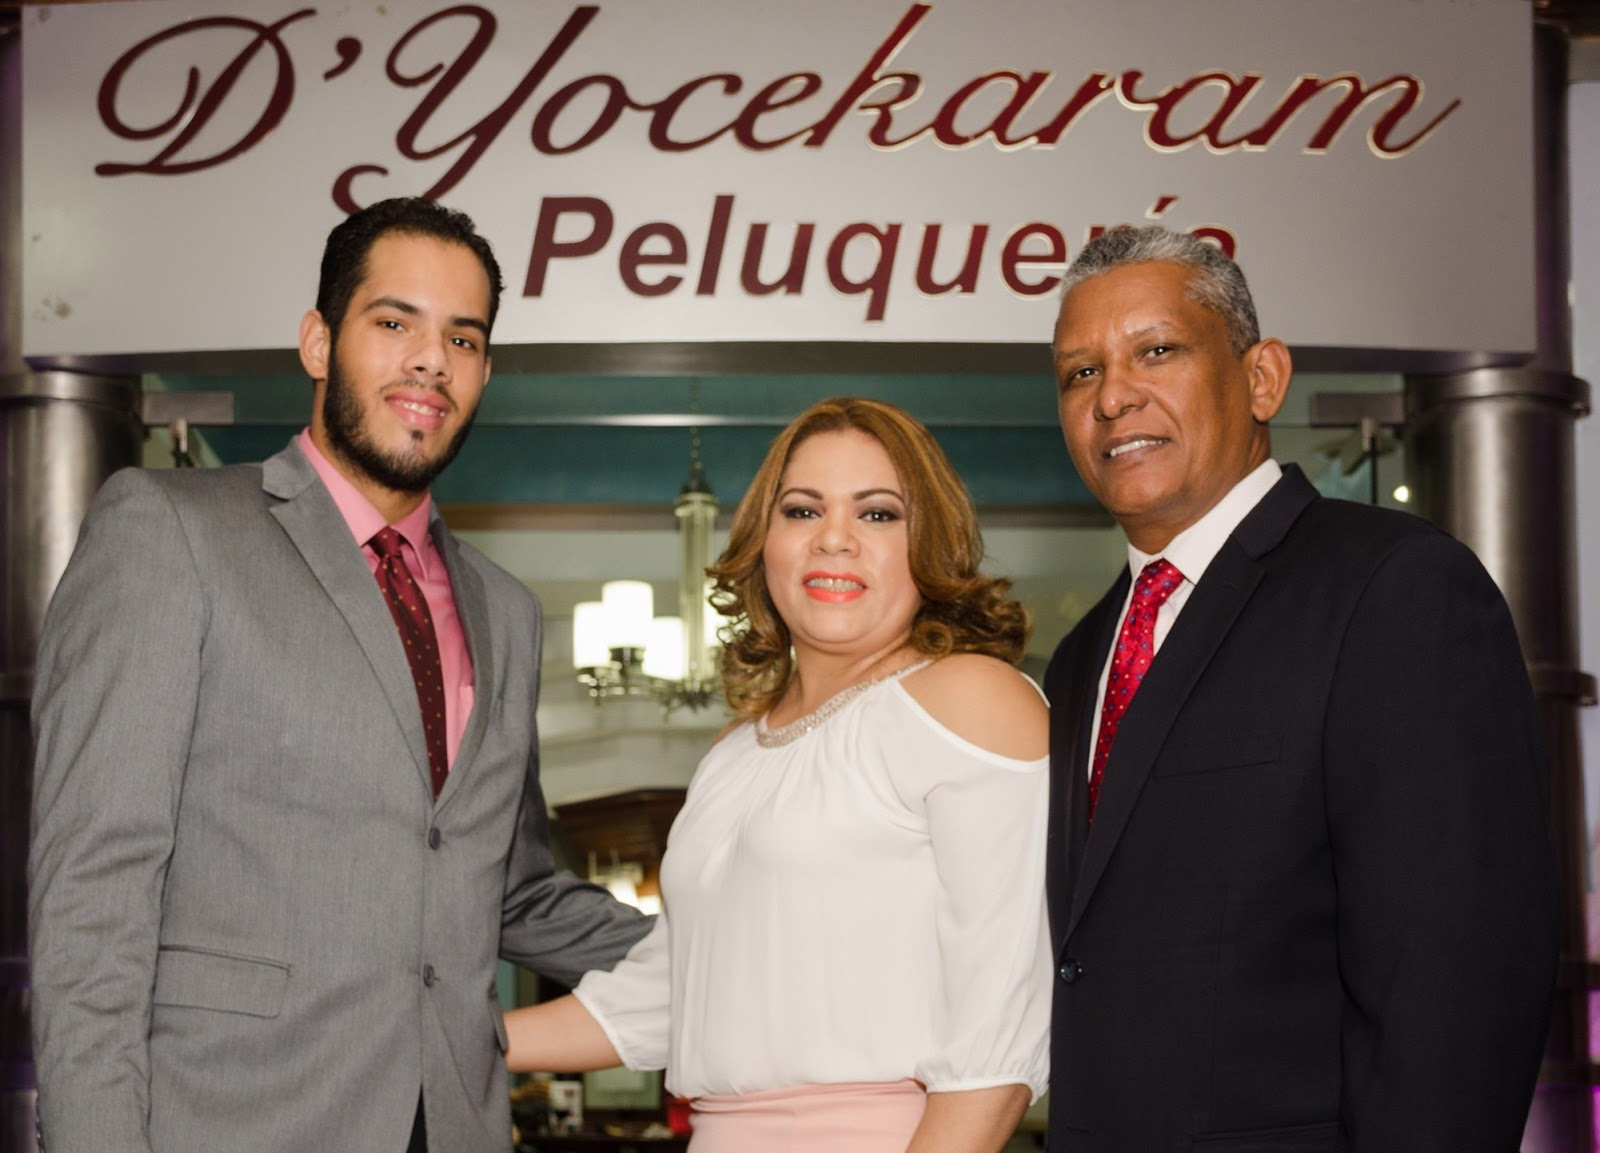 D yocekaram peluquer a reinaugura local en malecon center for Piso 9 malecon center